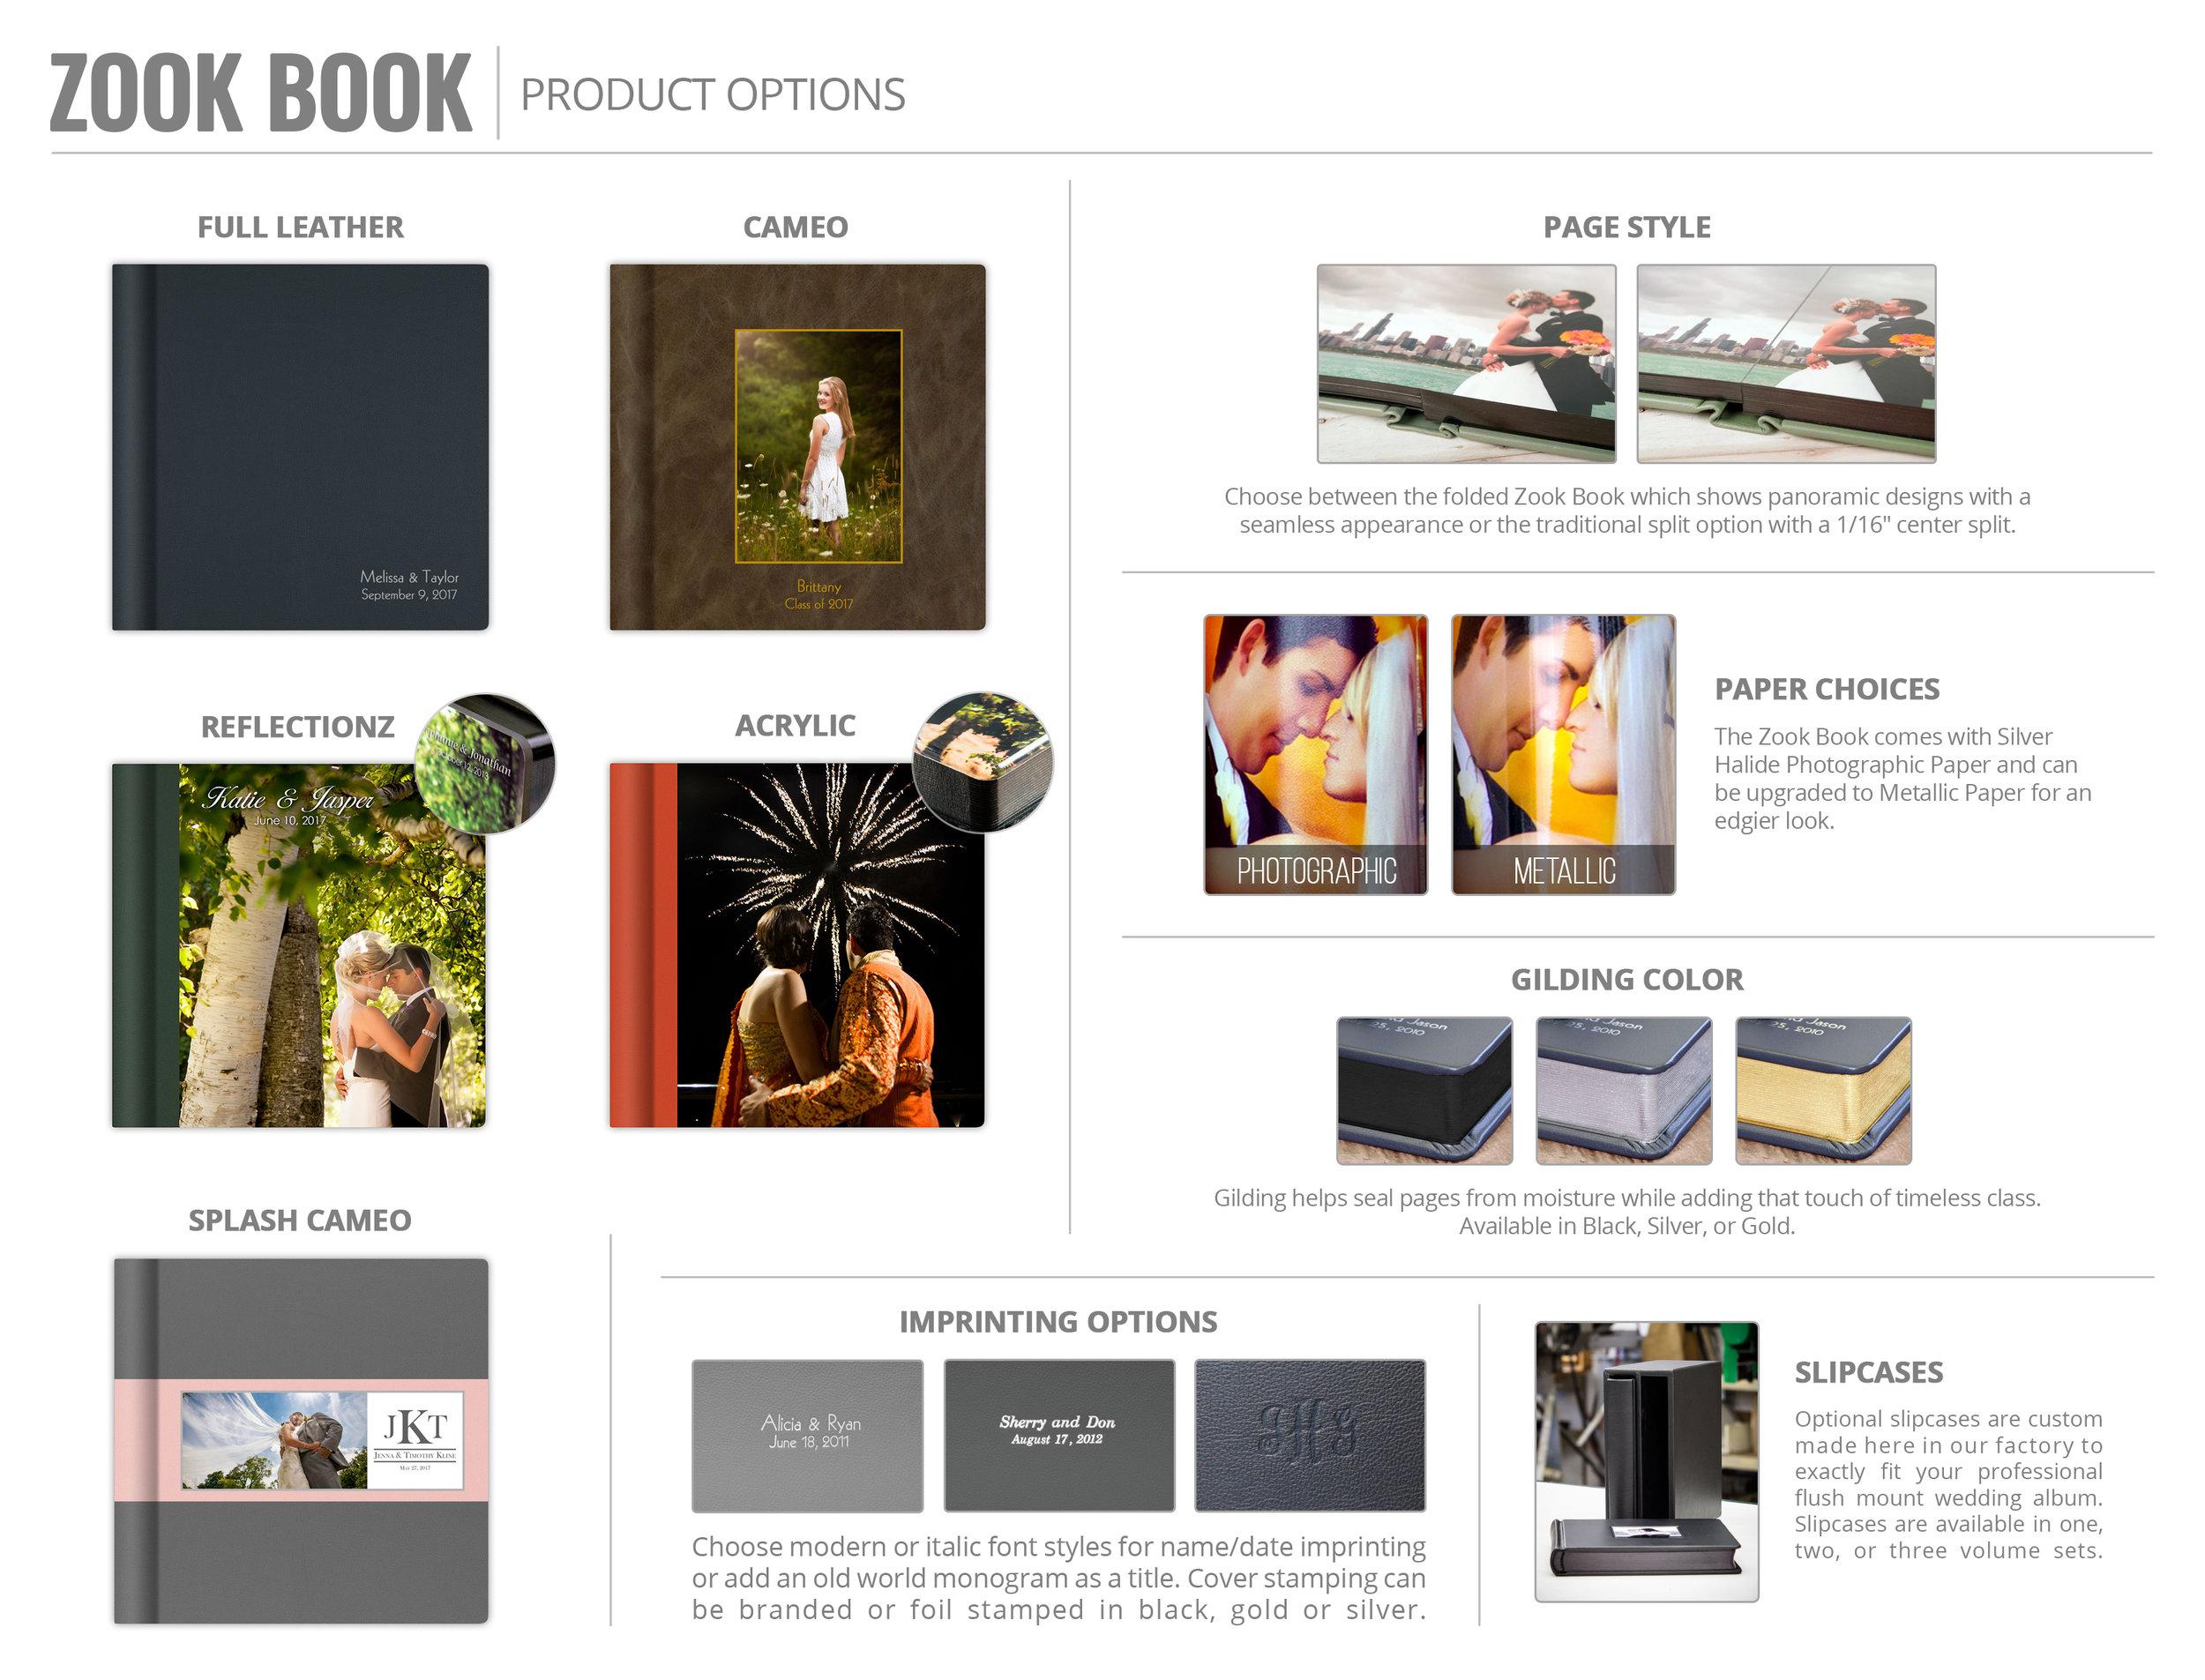 02-02_zbook-options.jpg